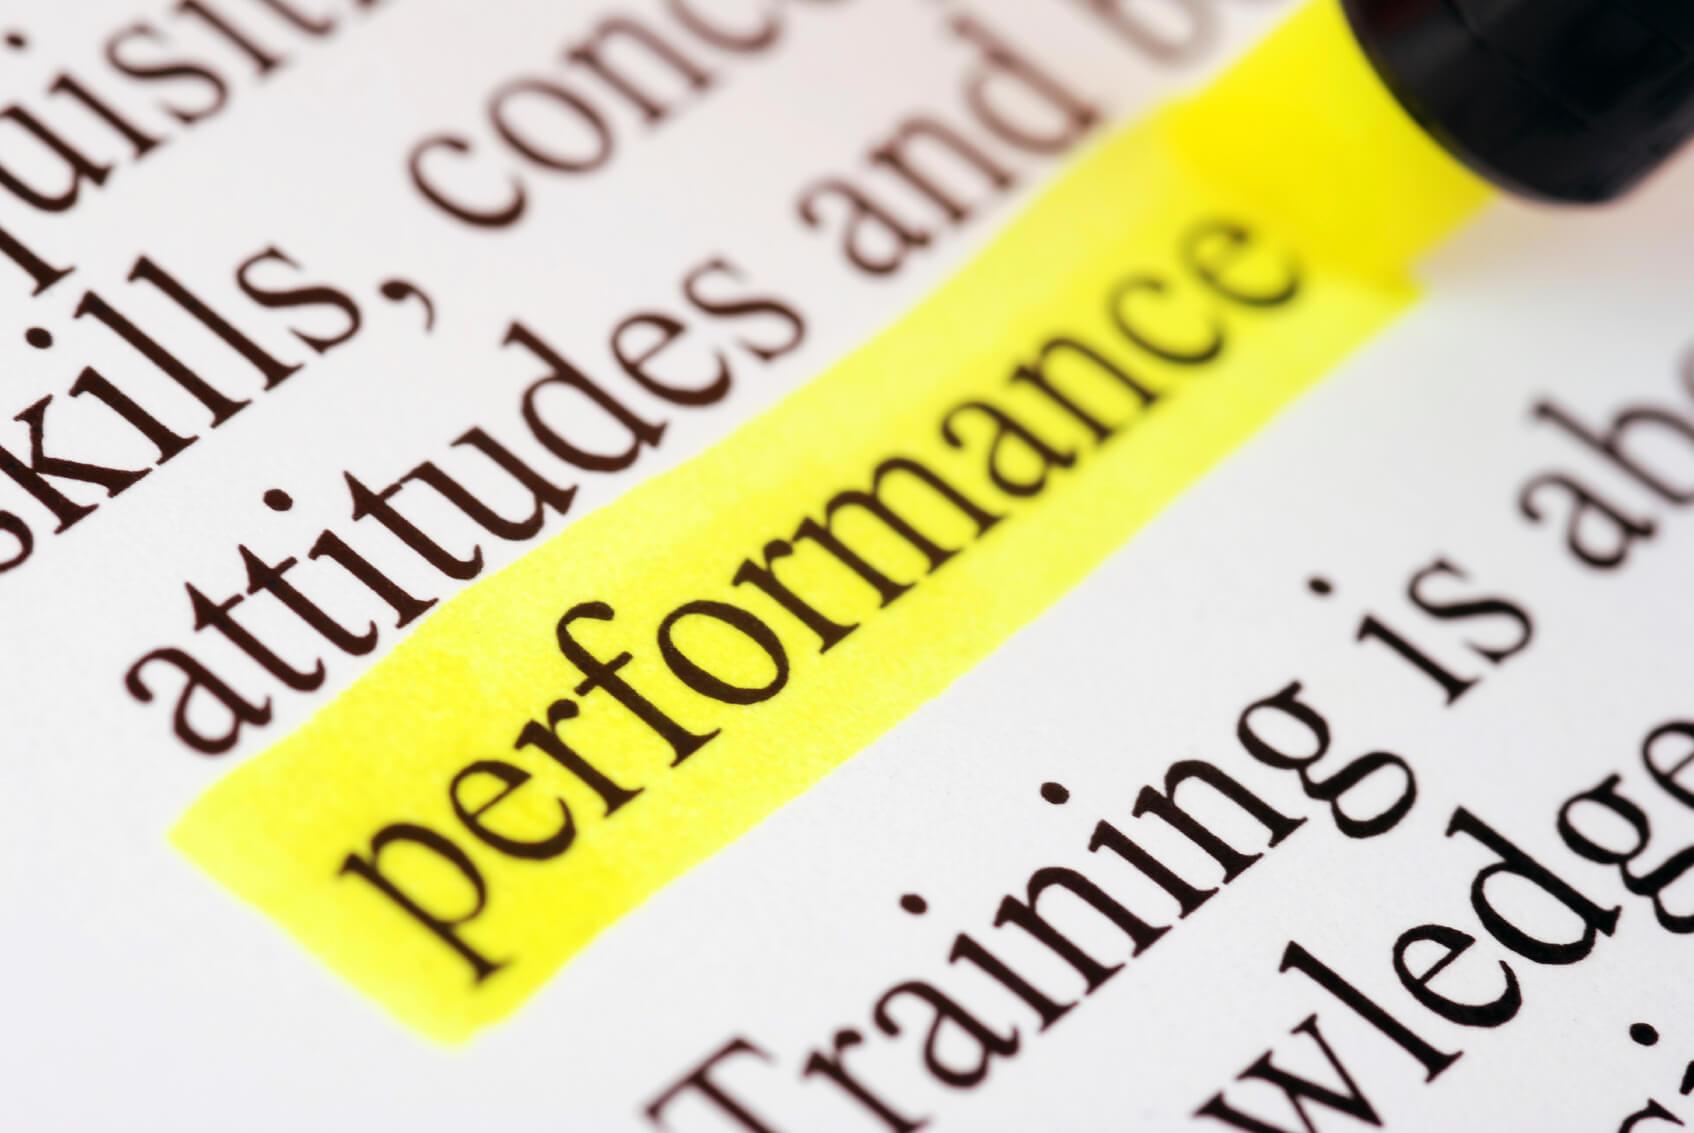 Indicadores de Performance - KPI